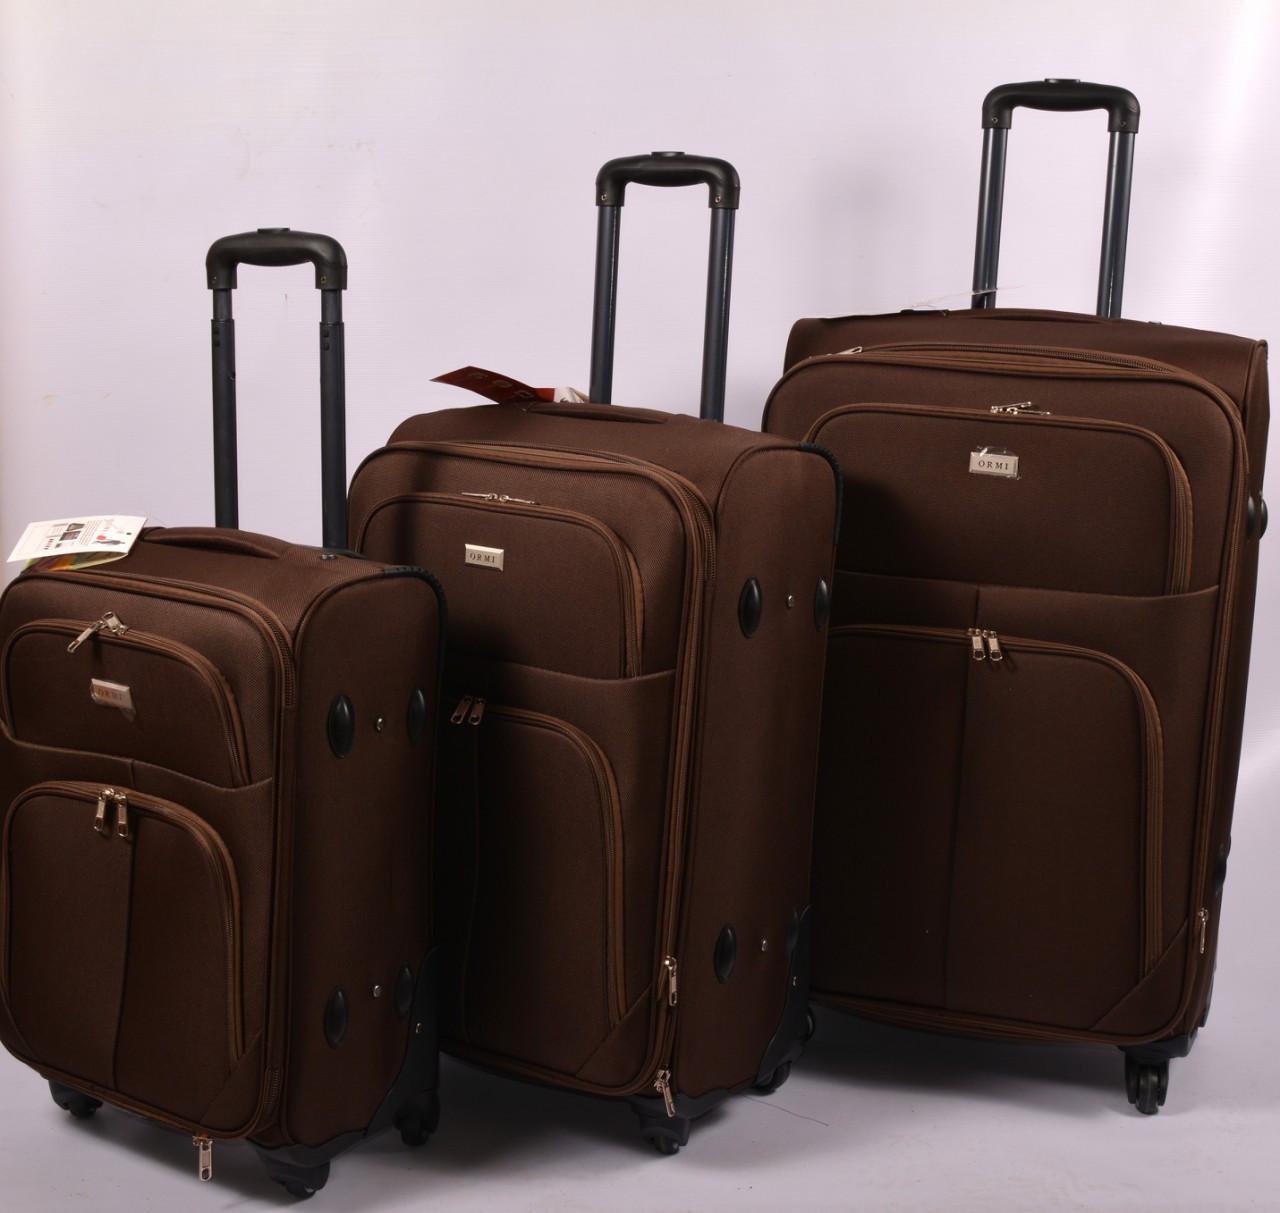 Тканевый дорожный чемодан ORMI на 4 - х колёсах большой